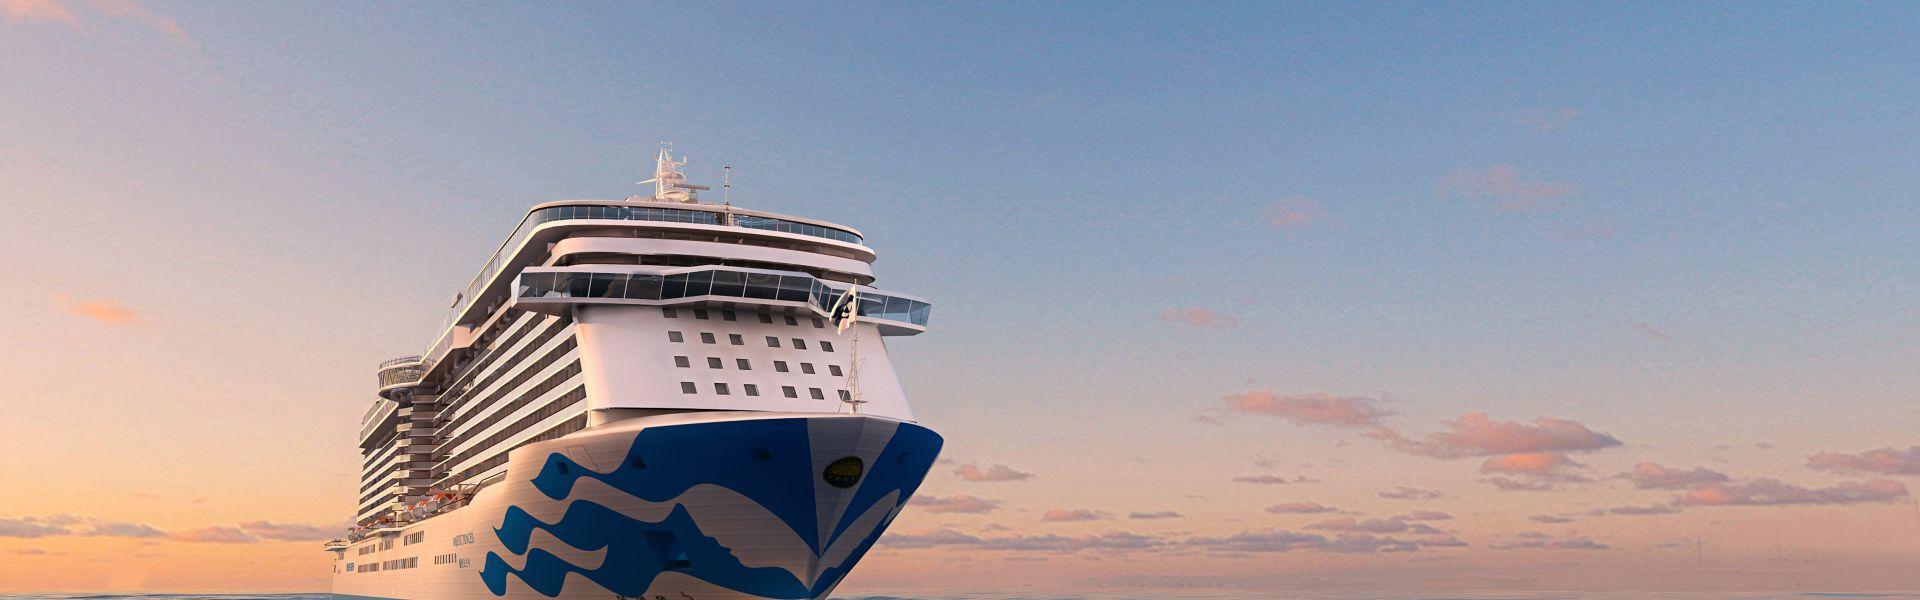 Croaziera 2017 - Insulele Grecesti si Turcia (Atena) - Princess Cruises - Majestic Cruises - 7 nopti